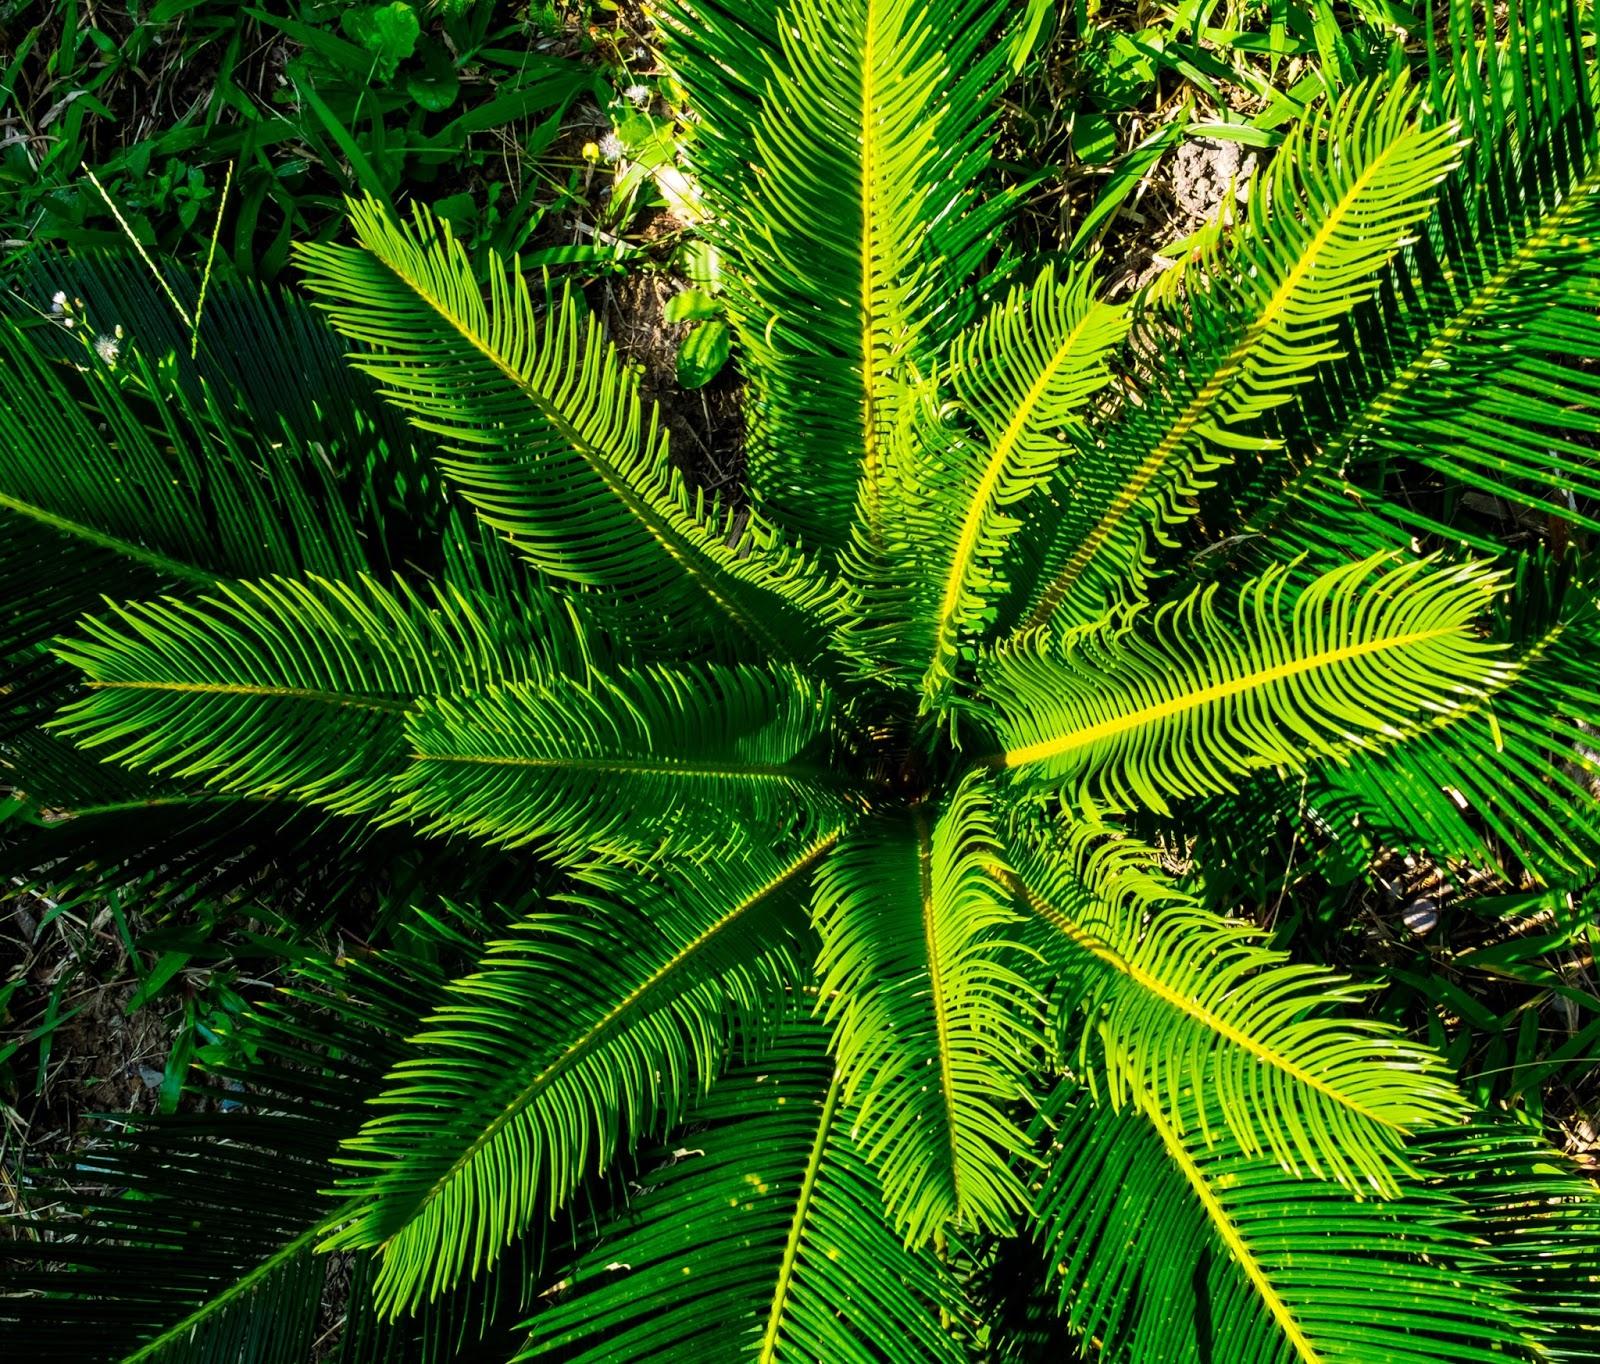 Sun Trust Palm Beach Gardens